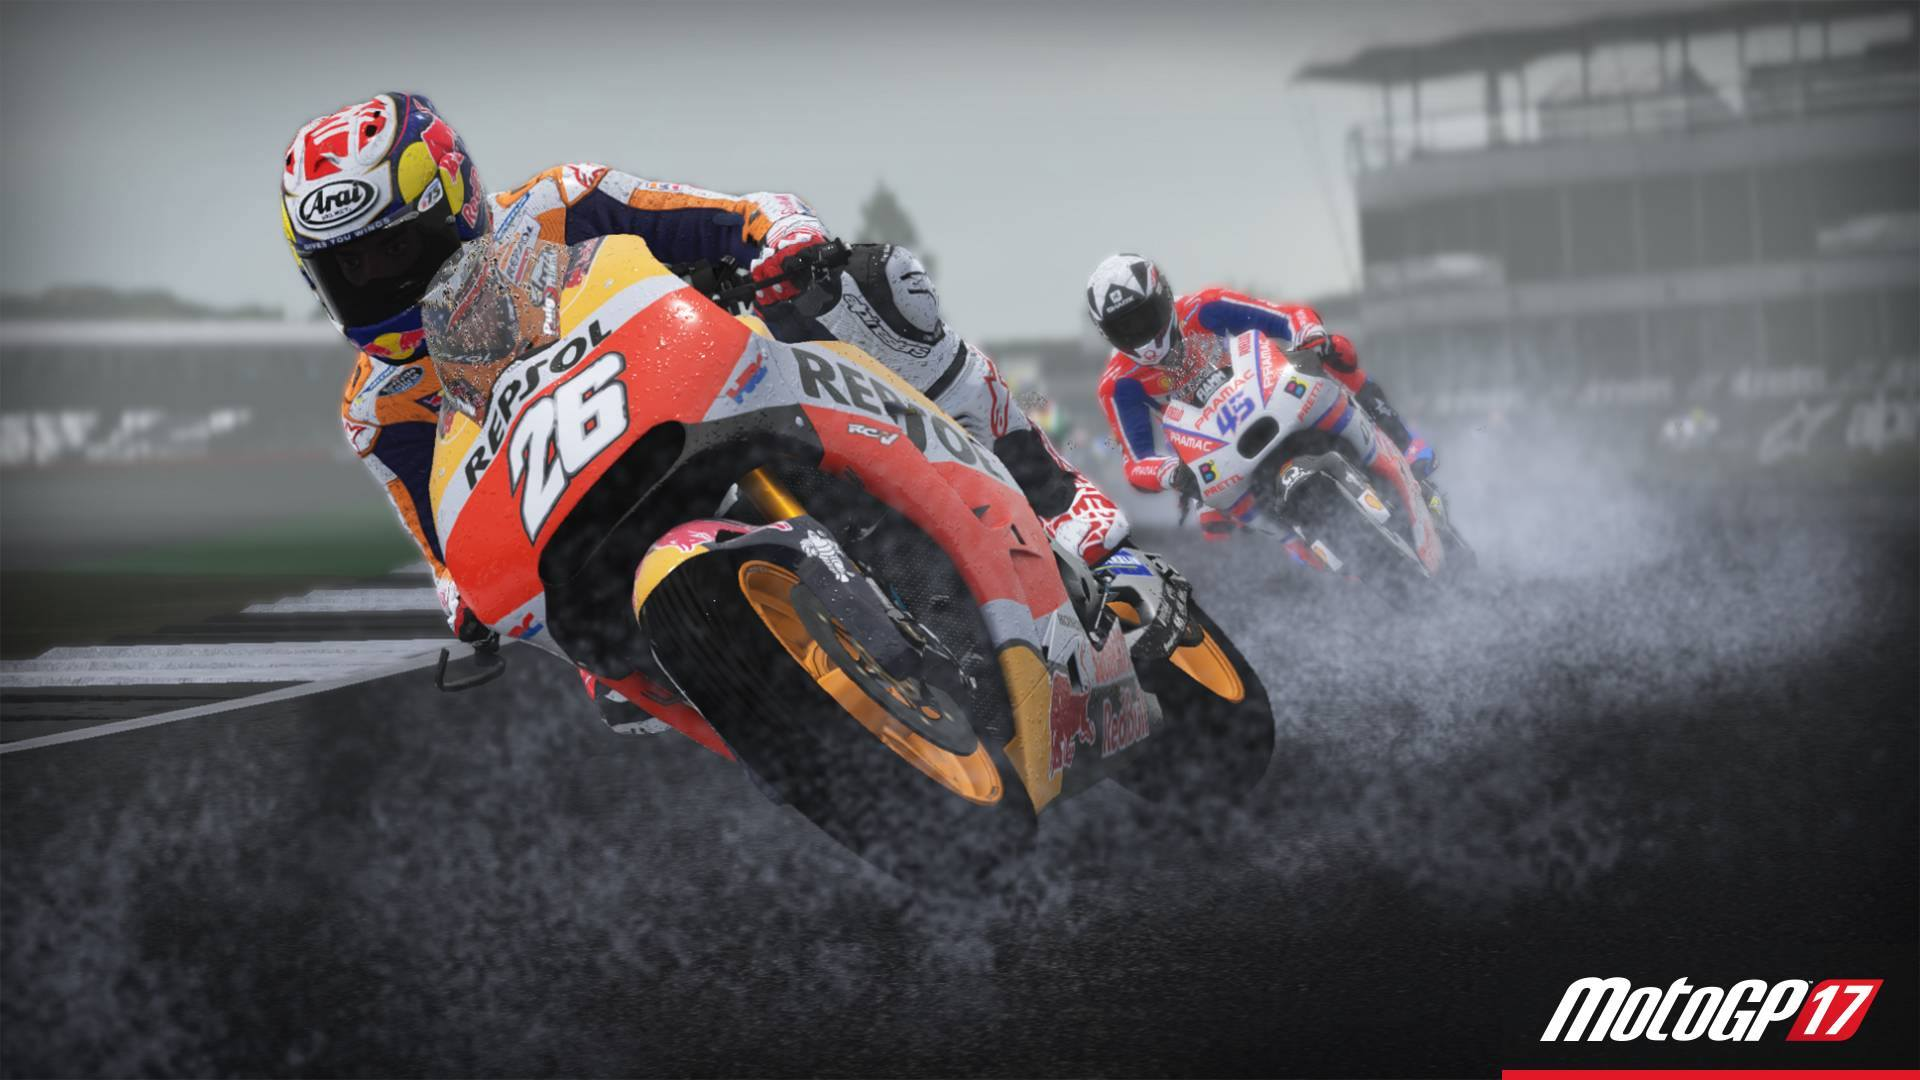 MotoGP 17 F